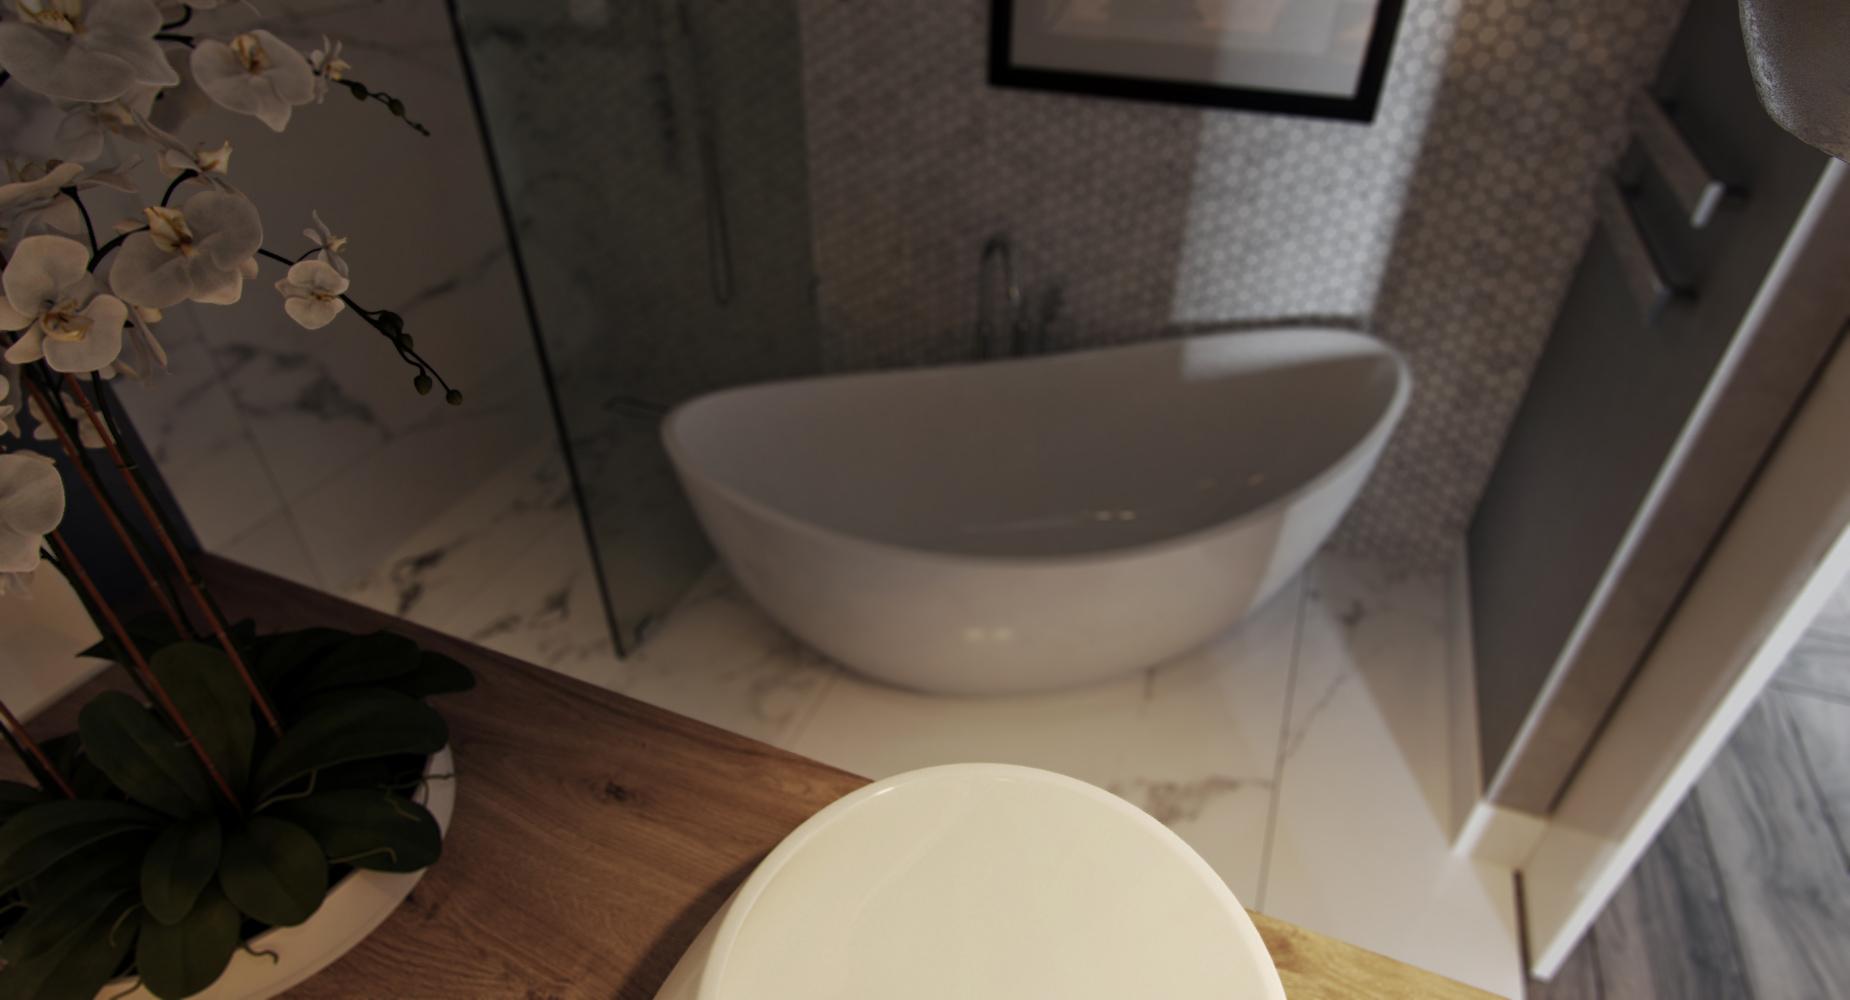 bath_room_3_night